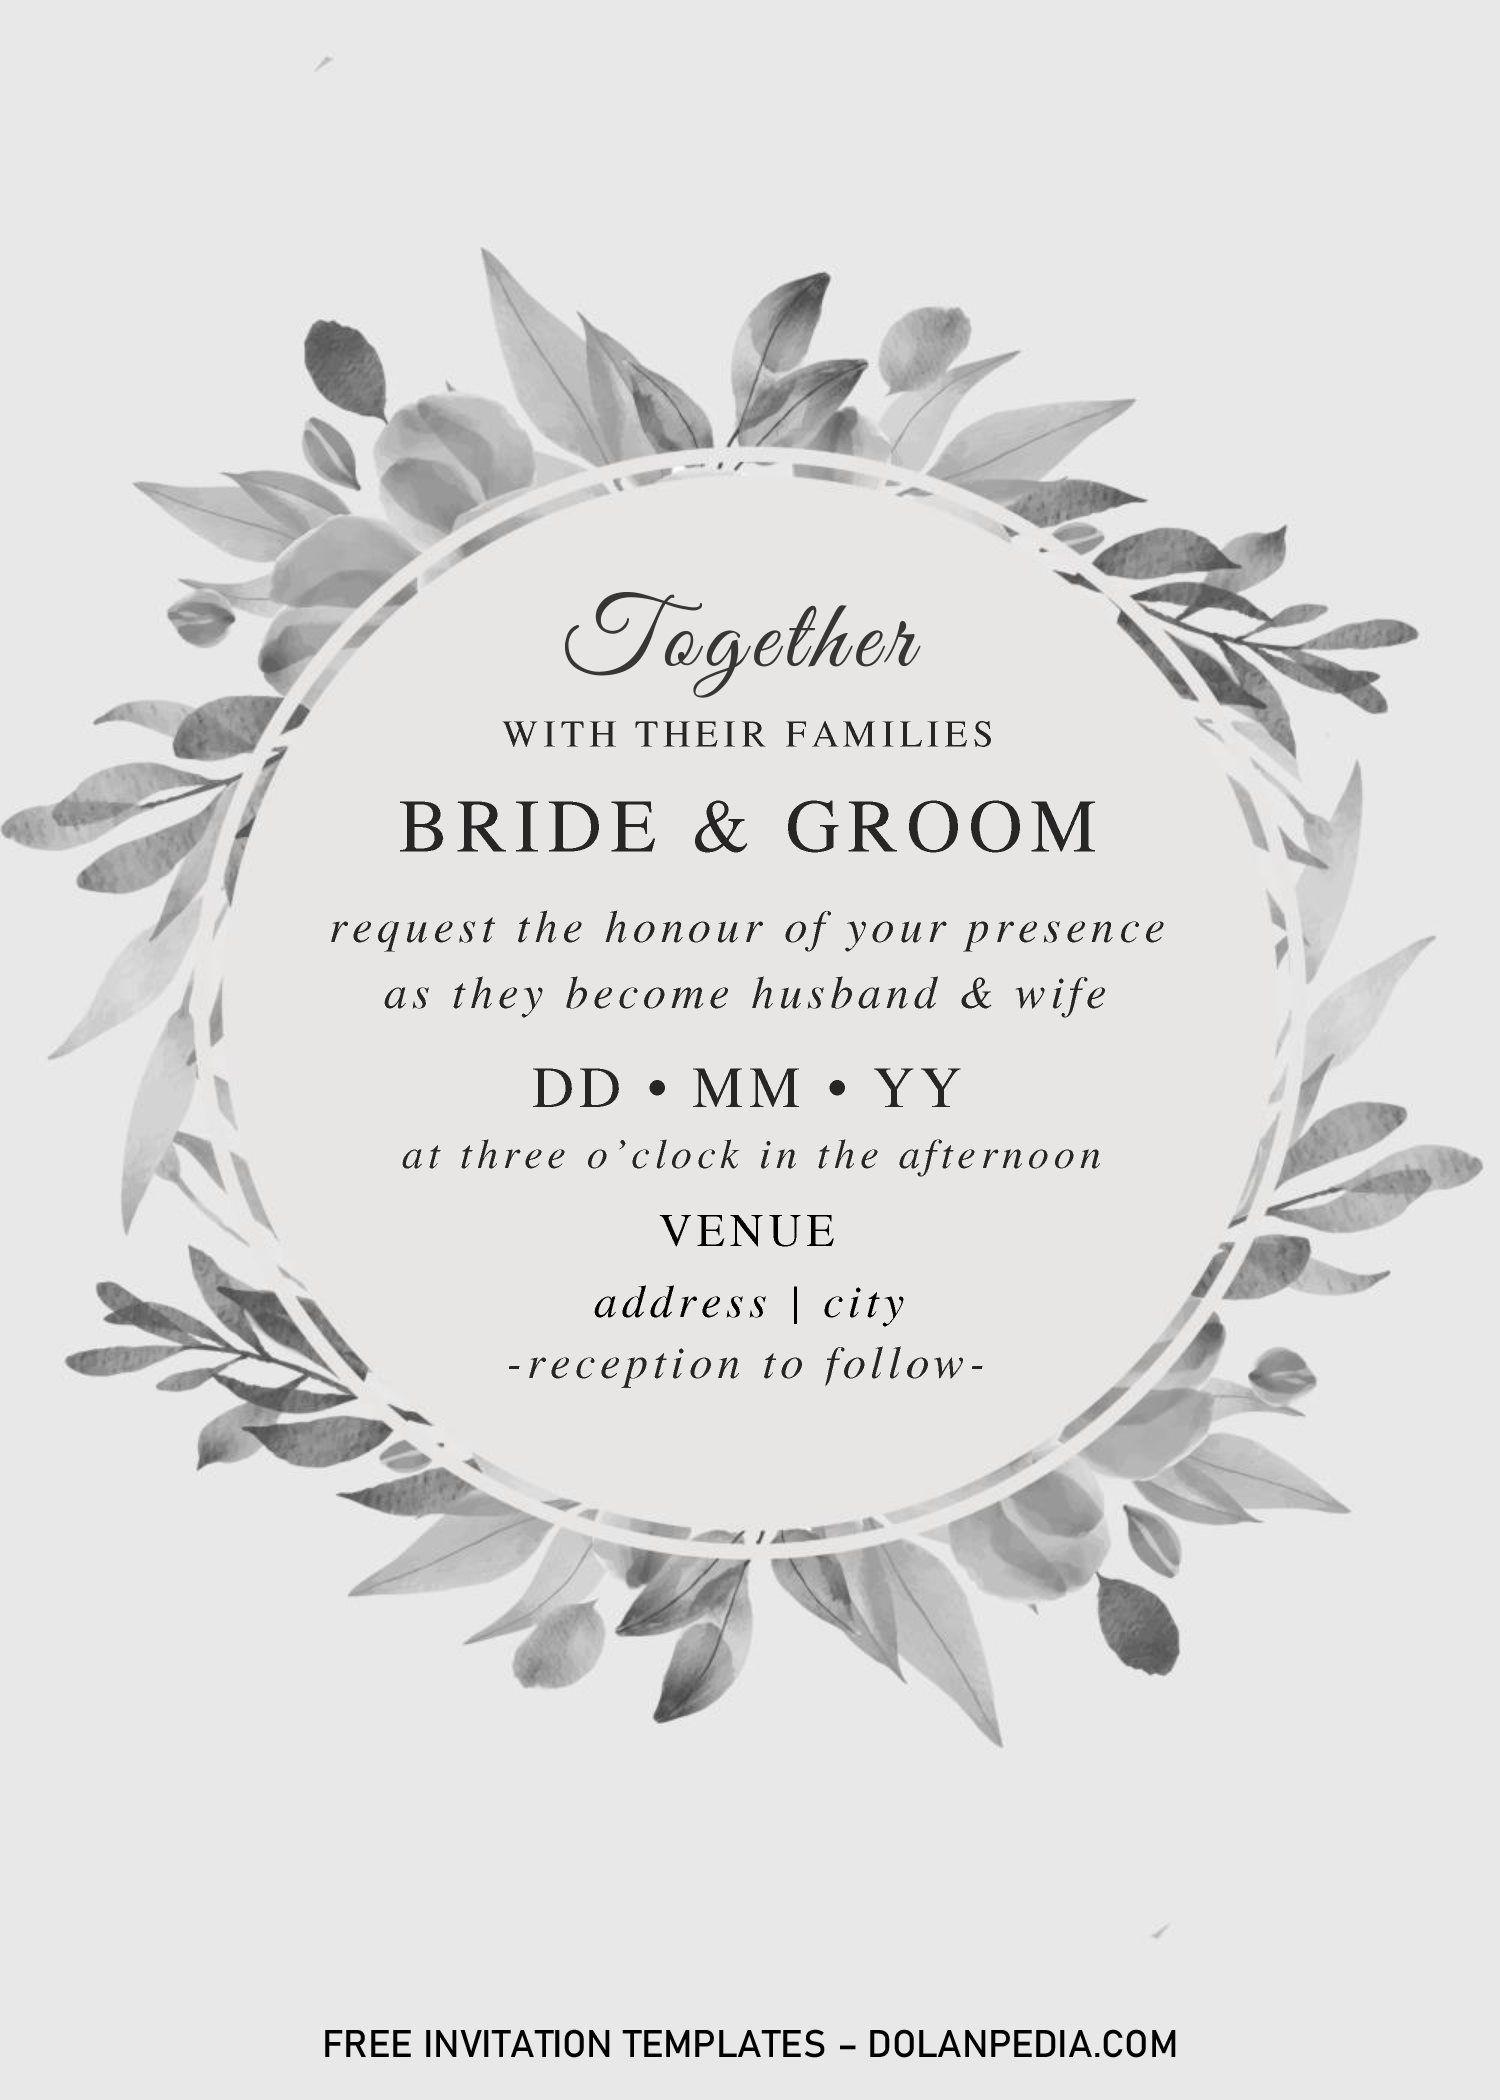 Black And White Wedding Invitation Templates Editable With Ms Word Black And White Wedding Invitations Wedding Invitation Templates Invitation Template - ms word wedding invitation templates